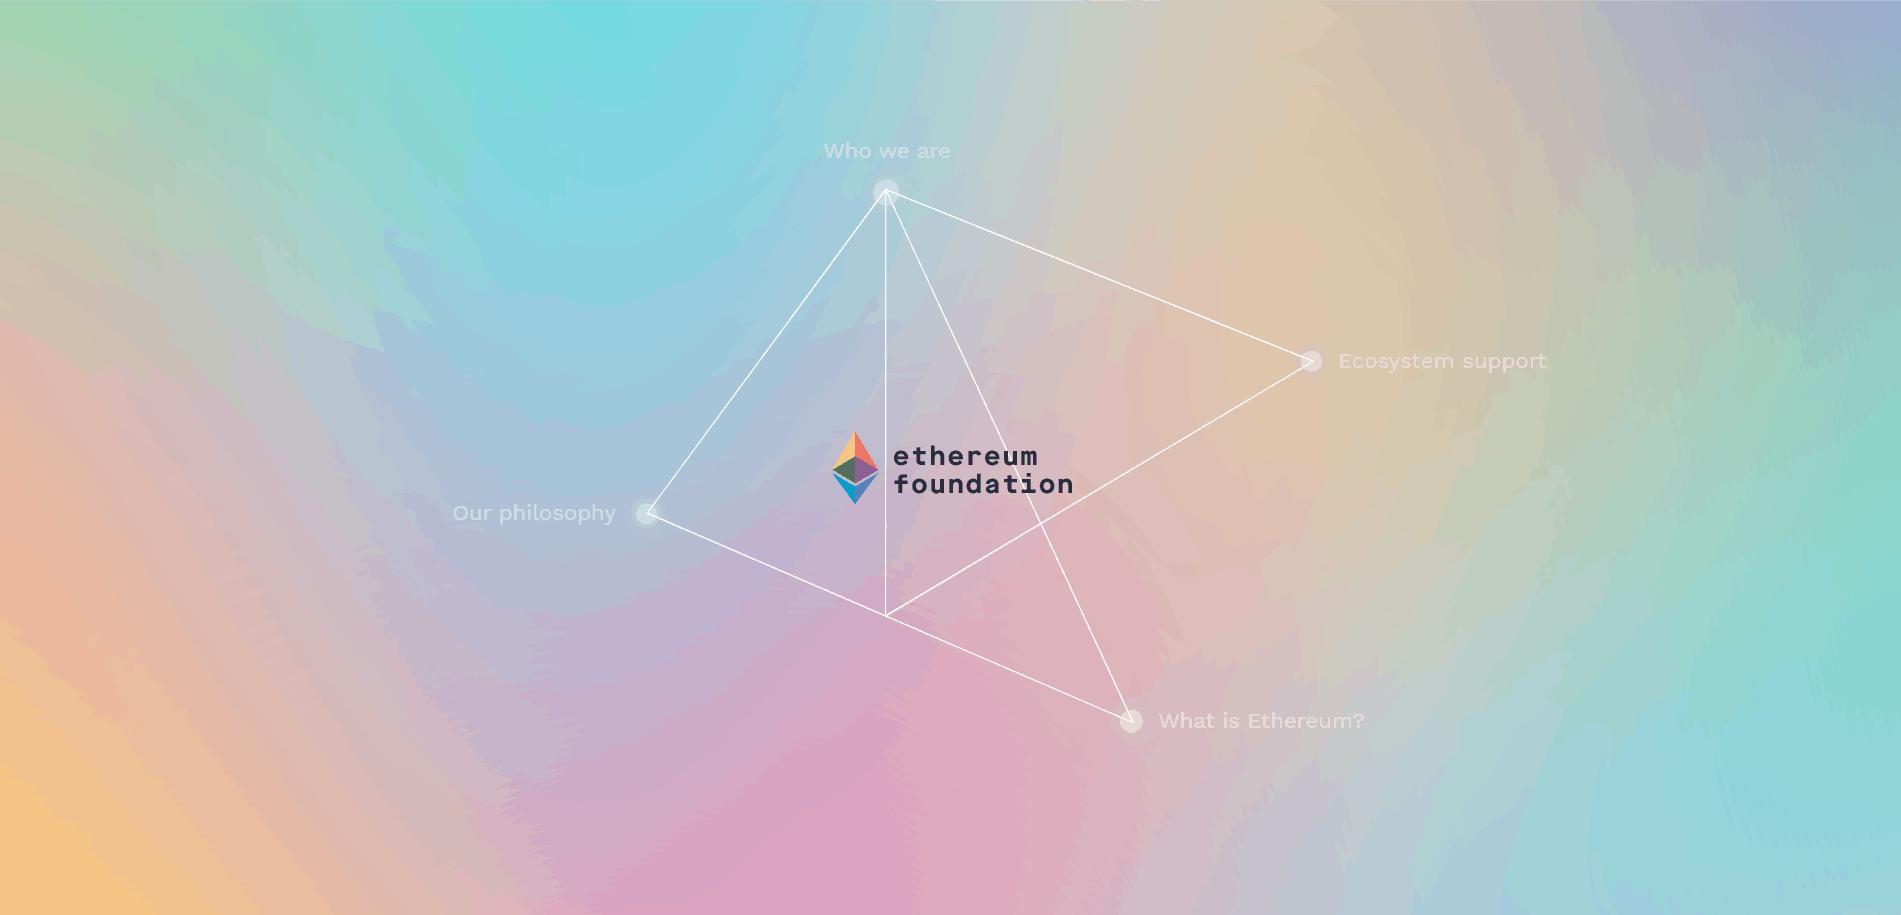 Ethereum Foundation, one of the pillars of Ethereum development